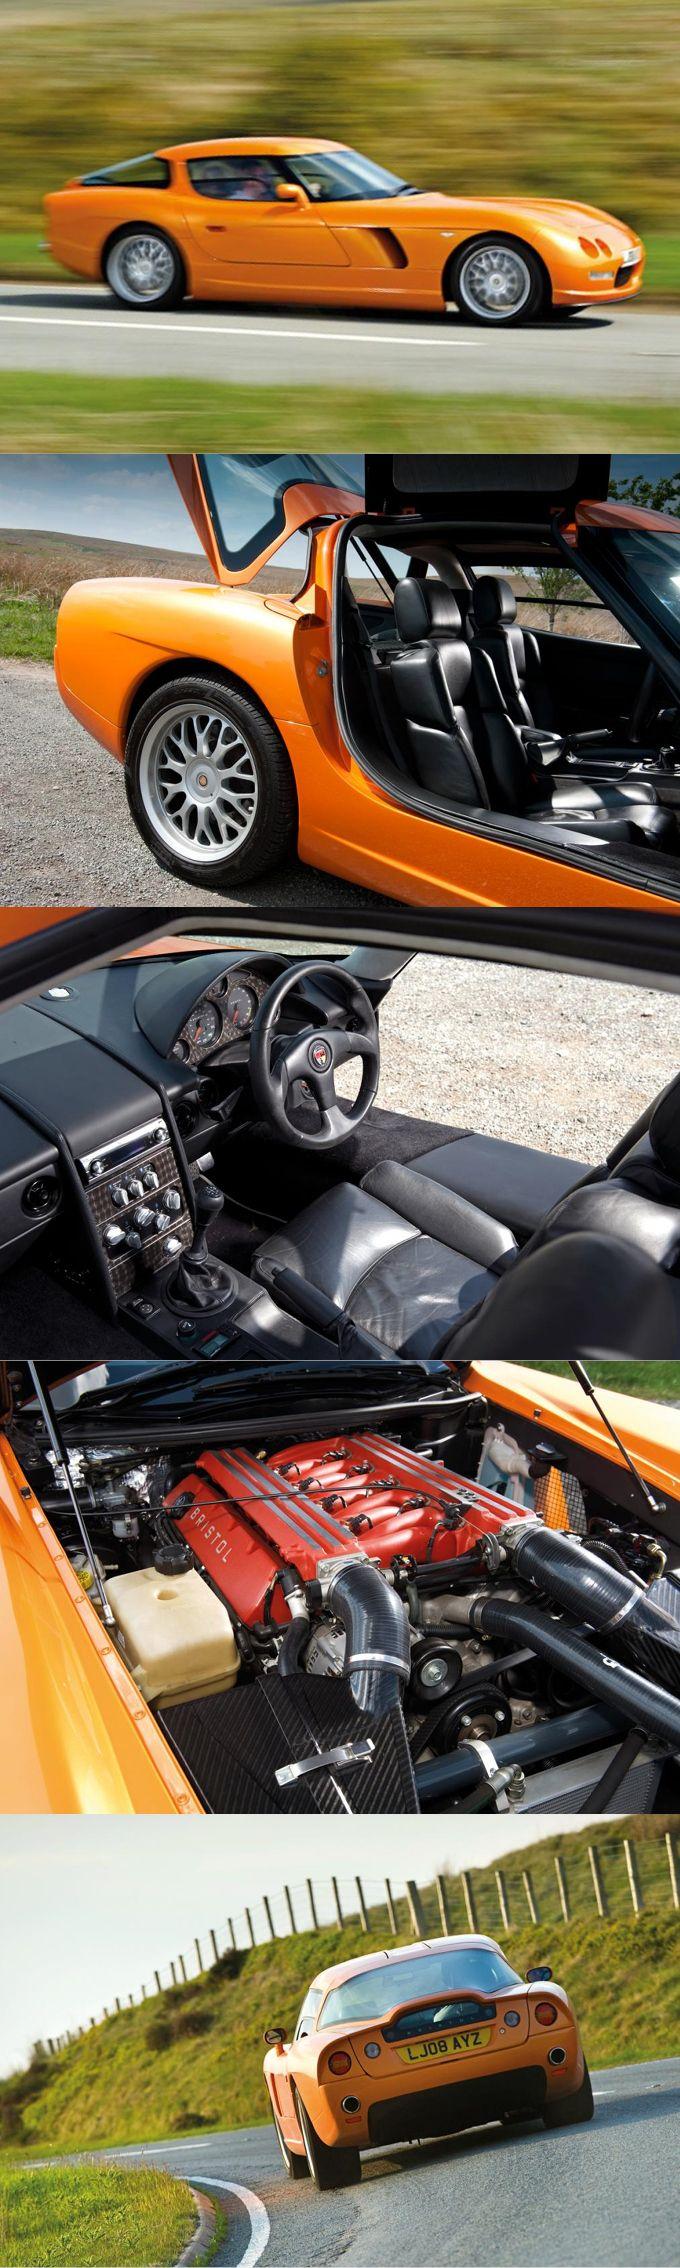 2004 Bristol Fighter / 525hp 8.0l Chrysler V10 / orange / UK